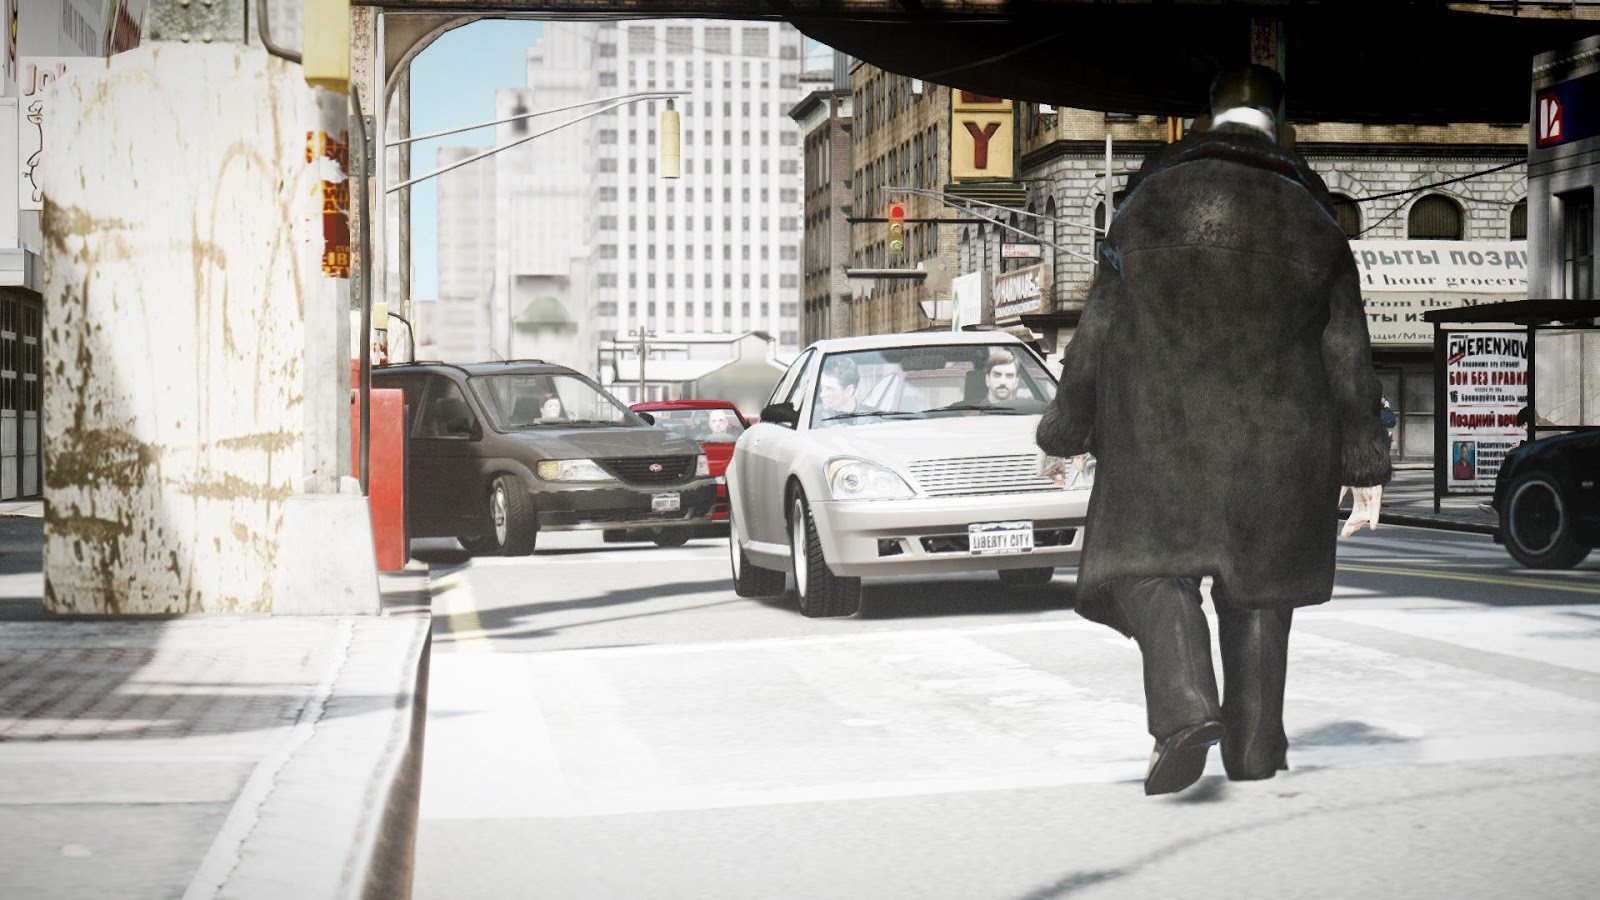 GTA 5,GTAV,GTA IV Mods and Skins: GTA 4 MOD:Max Payne 3